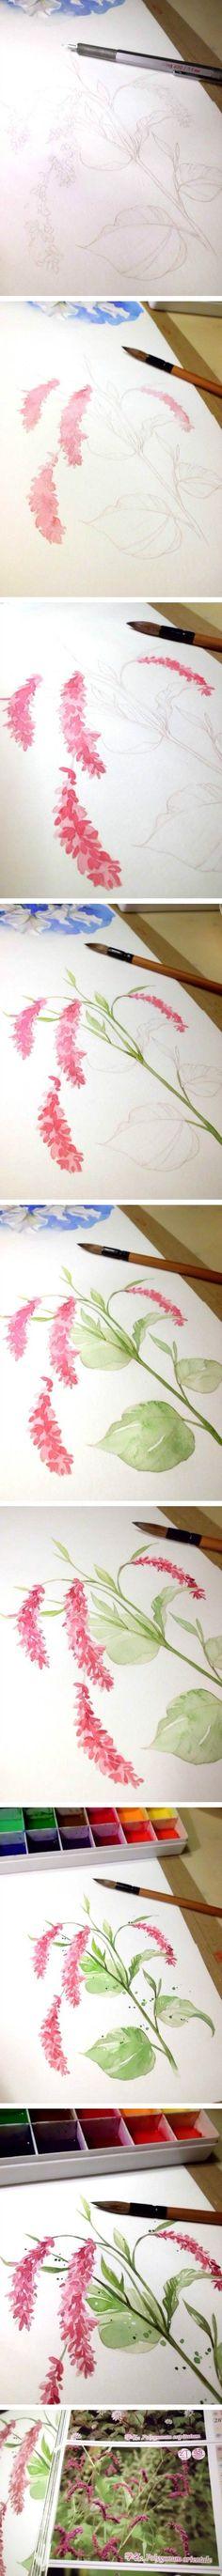 Painting watercolor flowers: